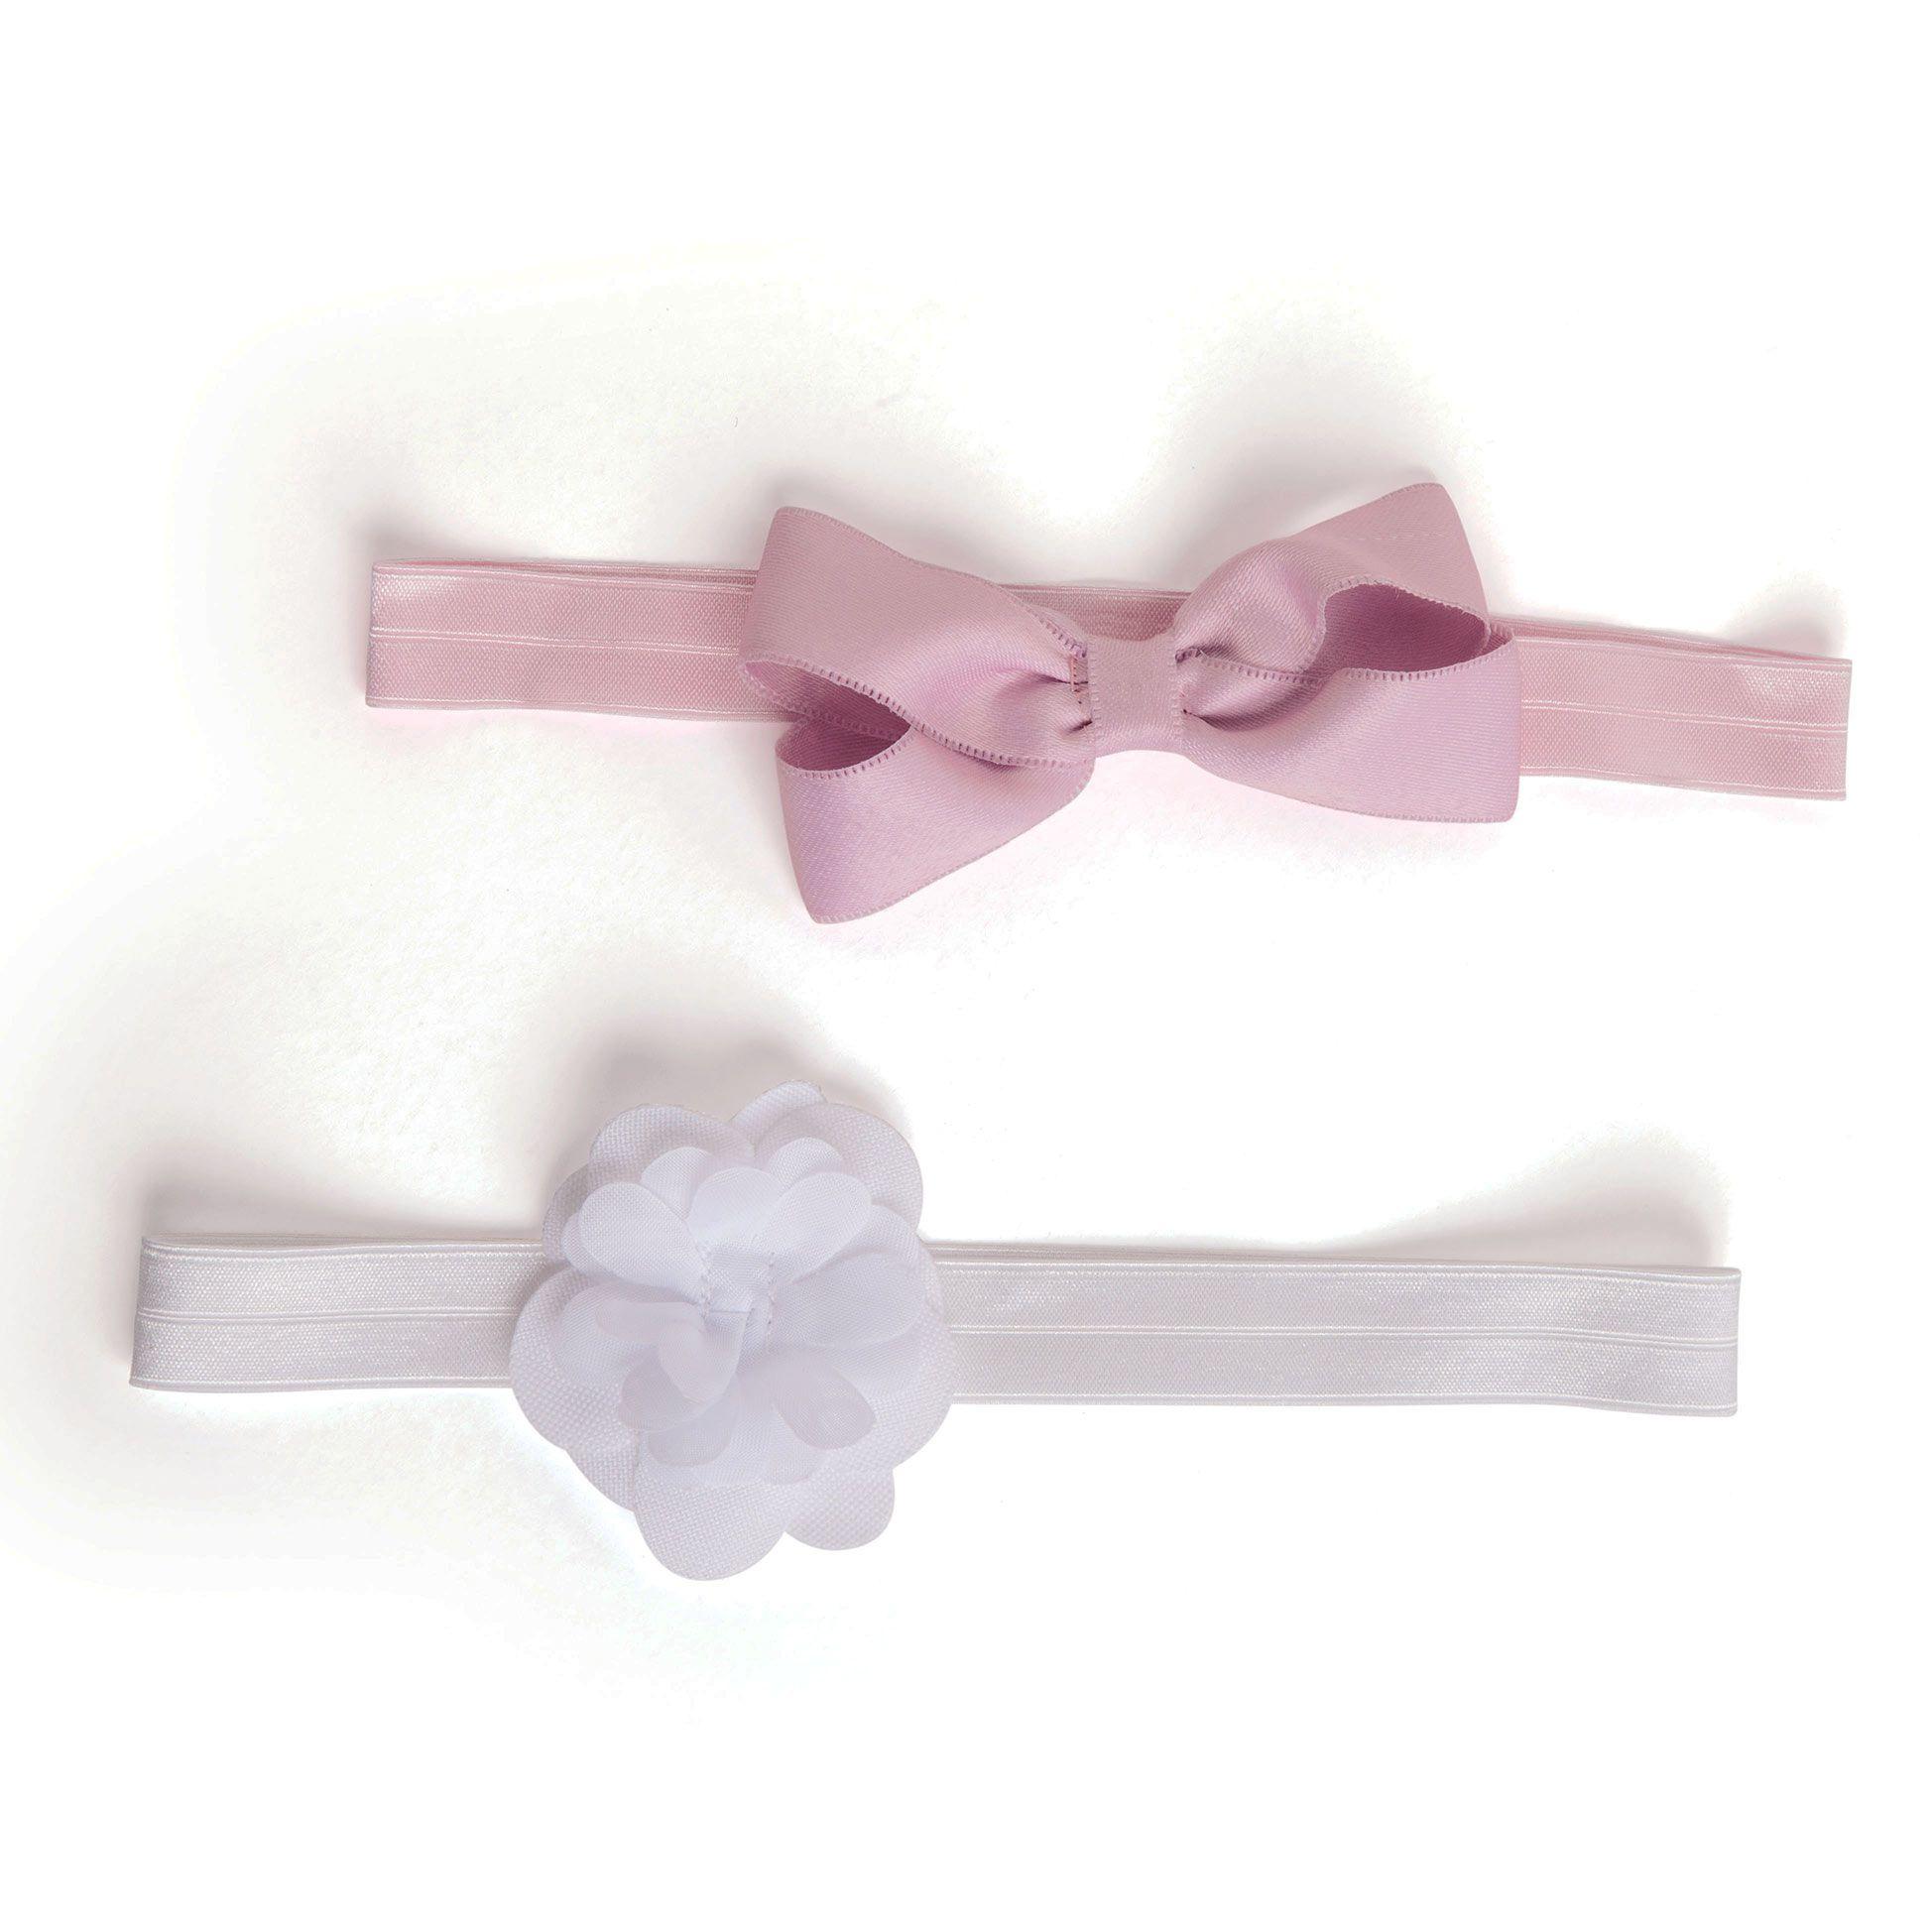 Duopack Faixa de Cabelo Branco e Rosa (0-12 meses) | PUKET